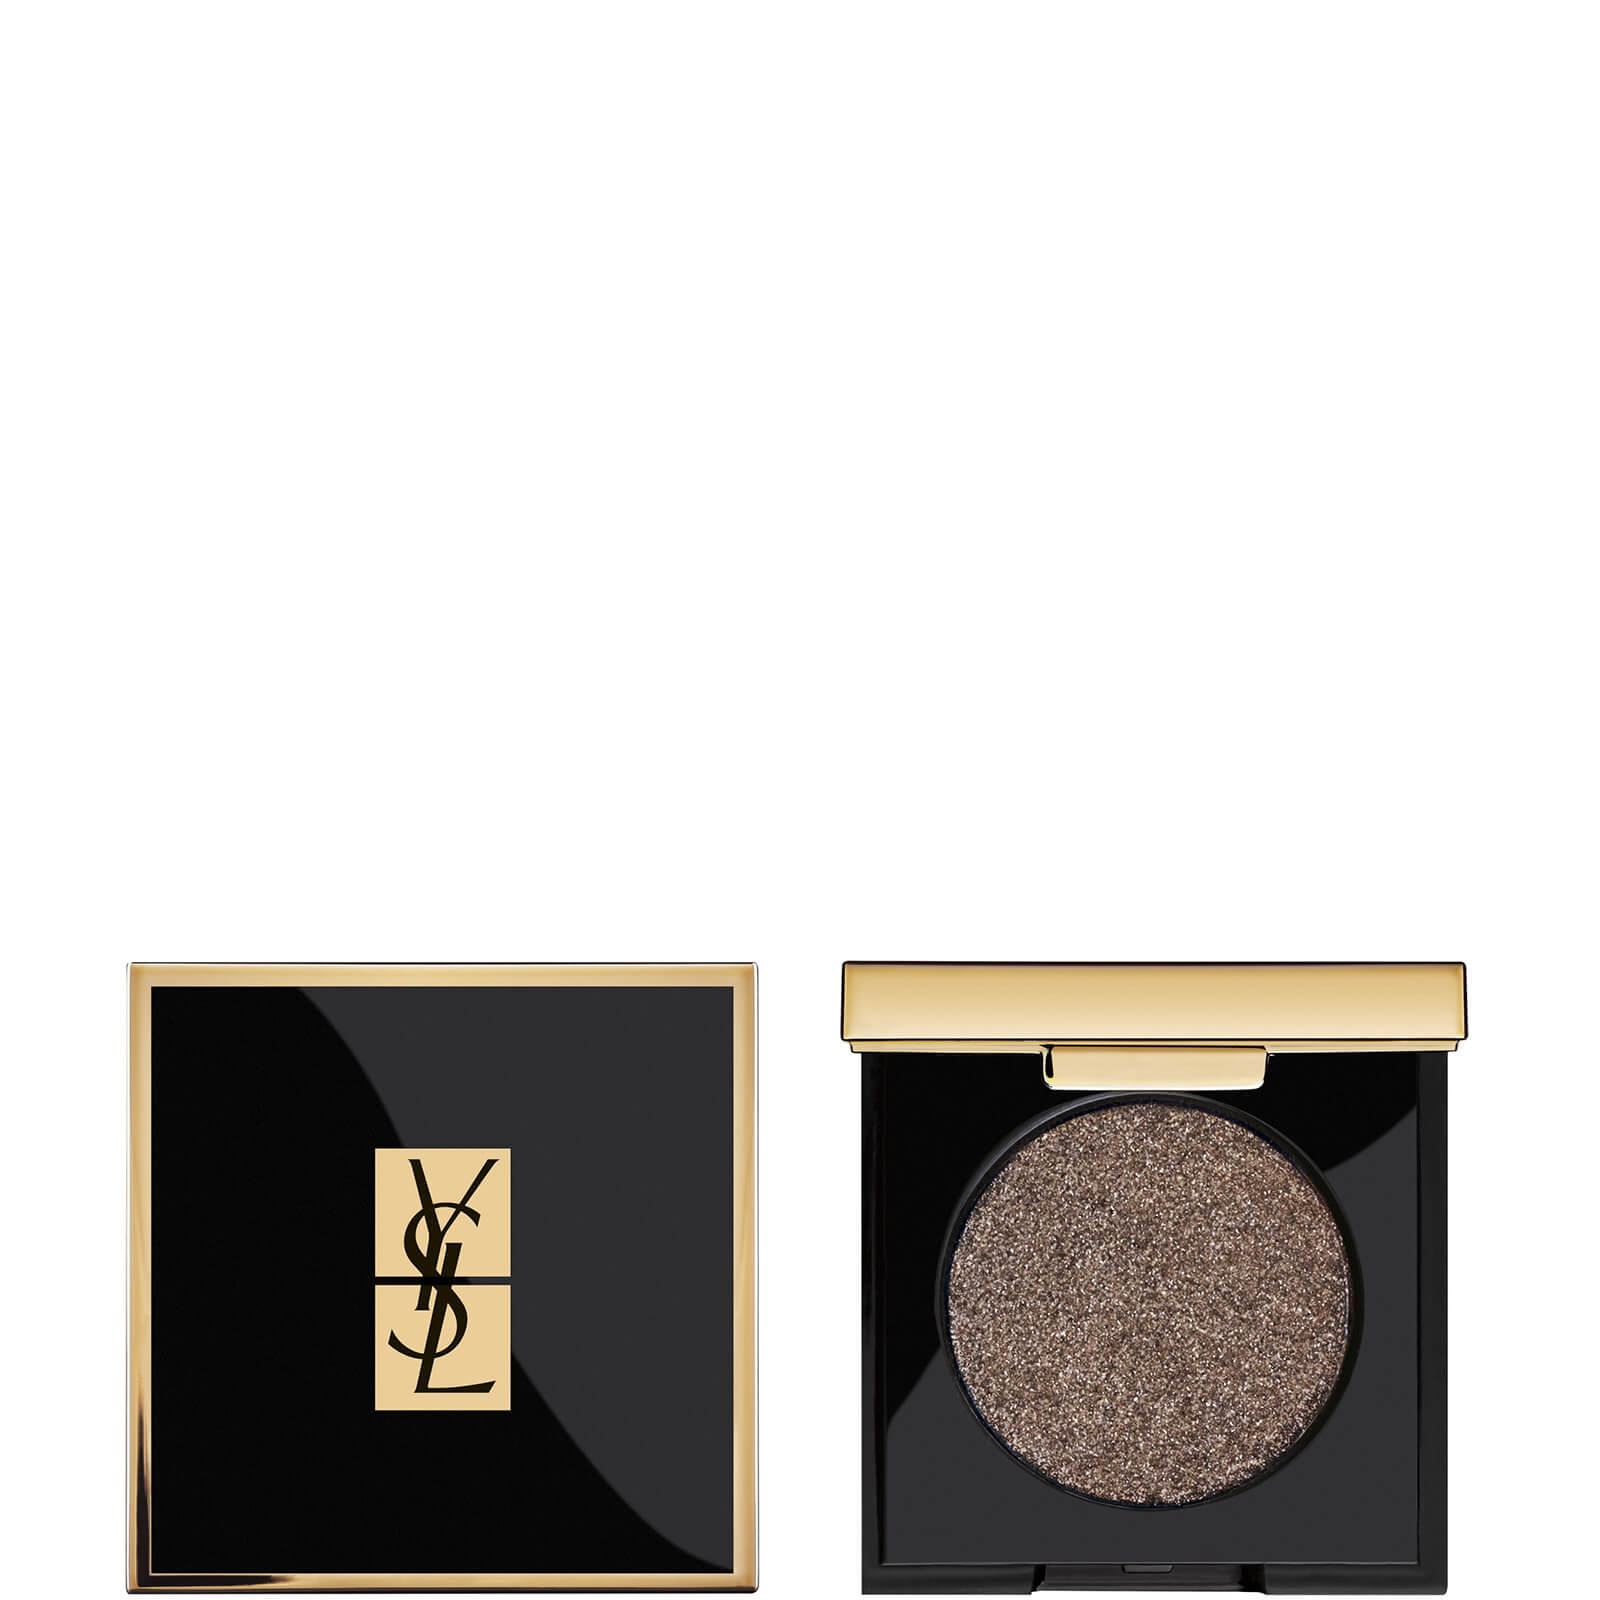 Купить Yves Saint Laurent Couture Crush Matte Mono Eyeshadow (Various Shades) - #43